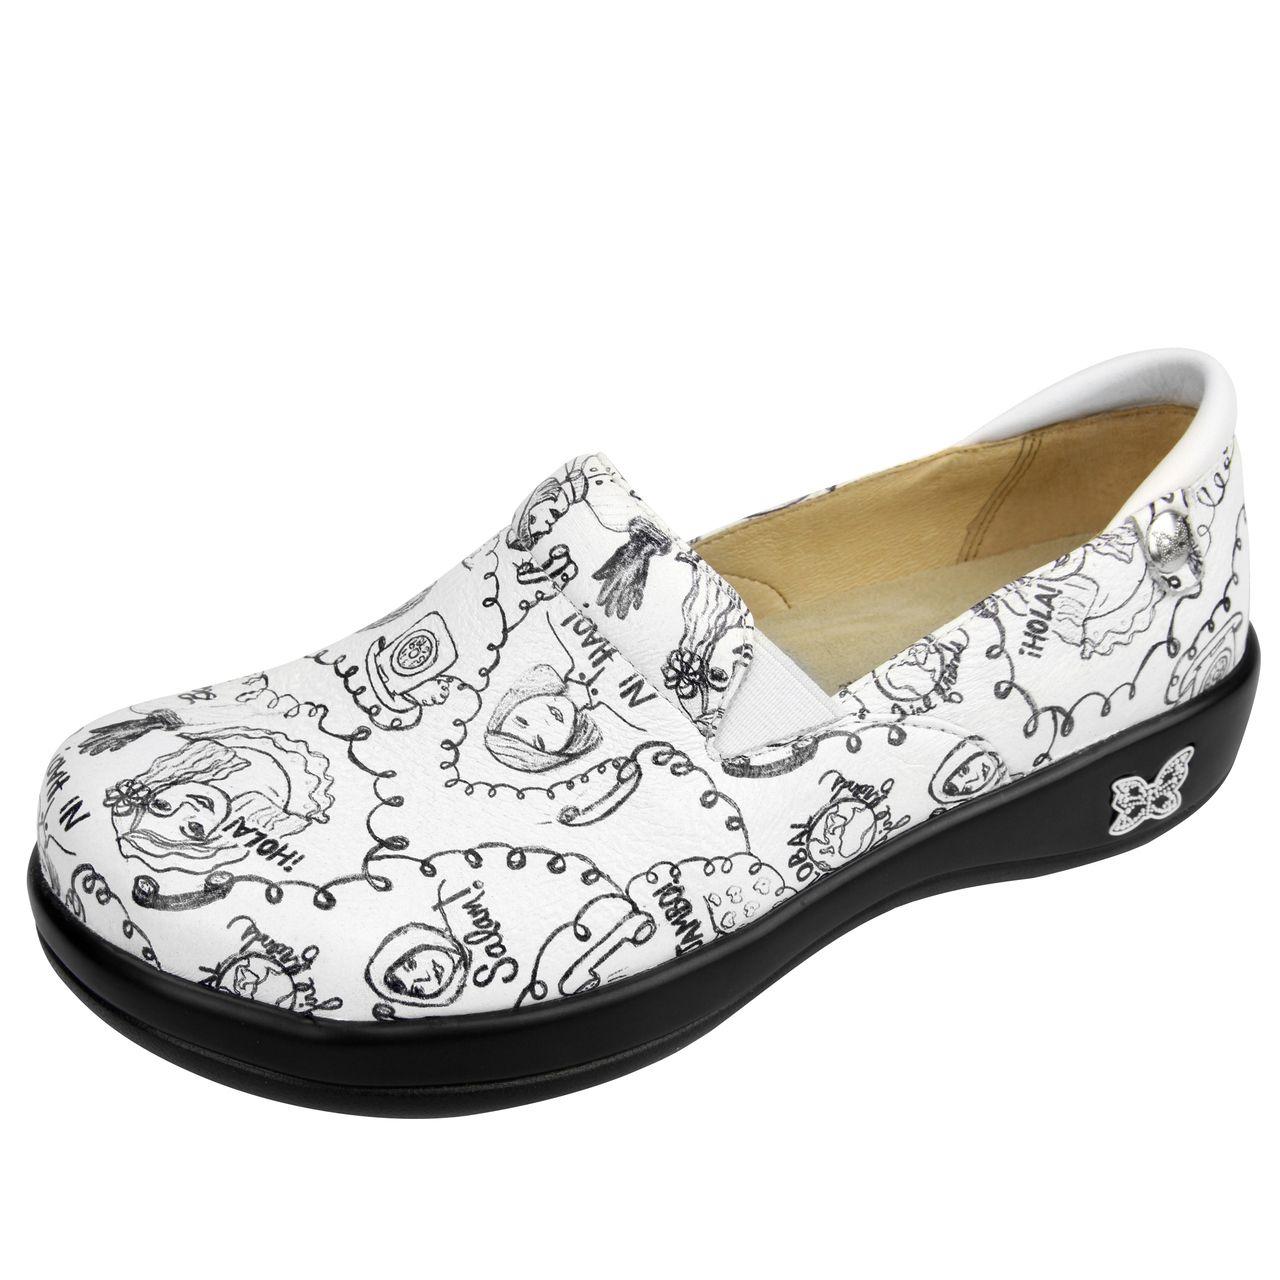 Alegria Shoes - Keli Hey Girlfriend Professional Nursing Shoe, $119.95 (http://www.alegriashoes.com/products/keli-hey-girlfriend-professional-nursing-shoe.html)